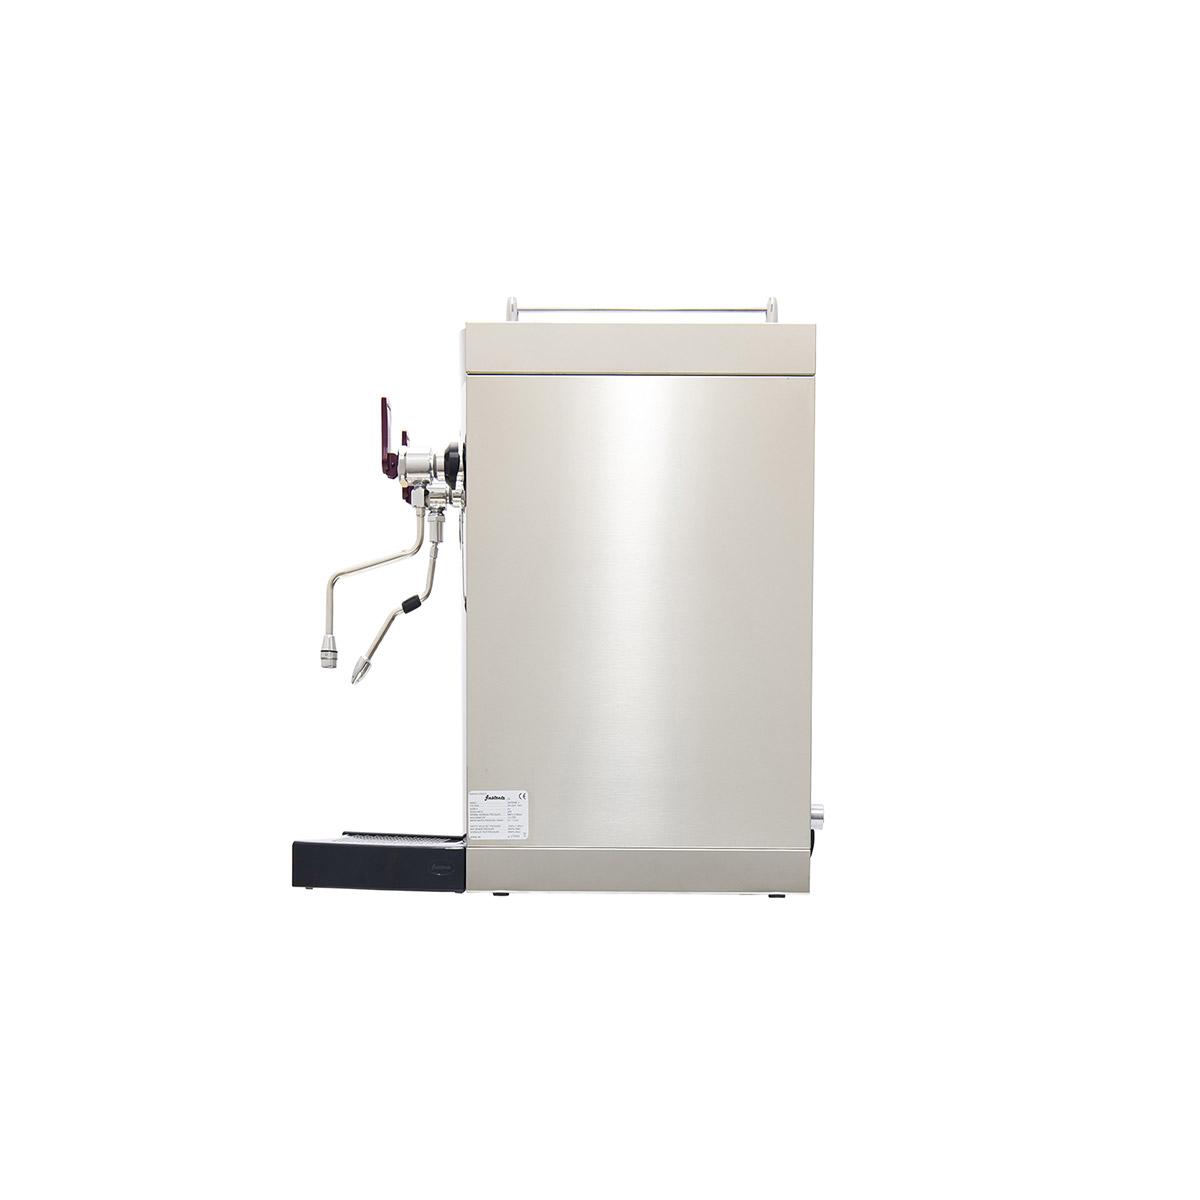 Instanta Counter Top Water Boiler Barista Pro SW13 13Ltr